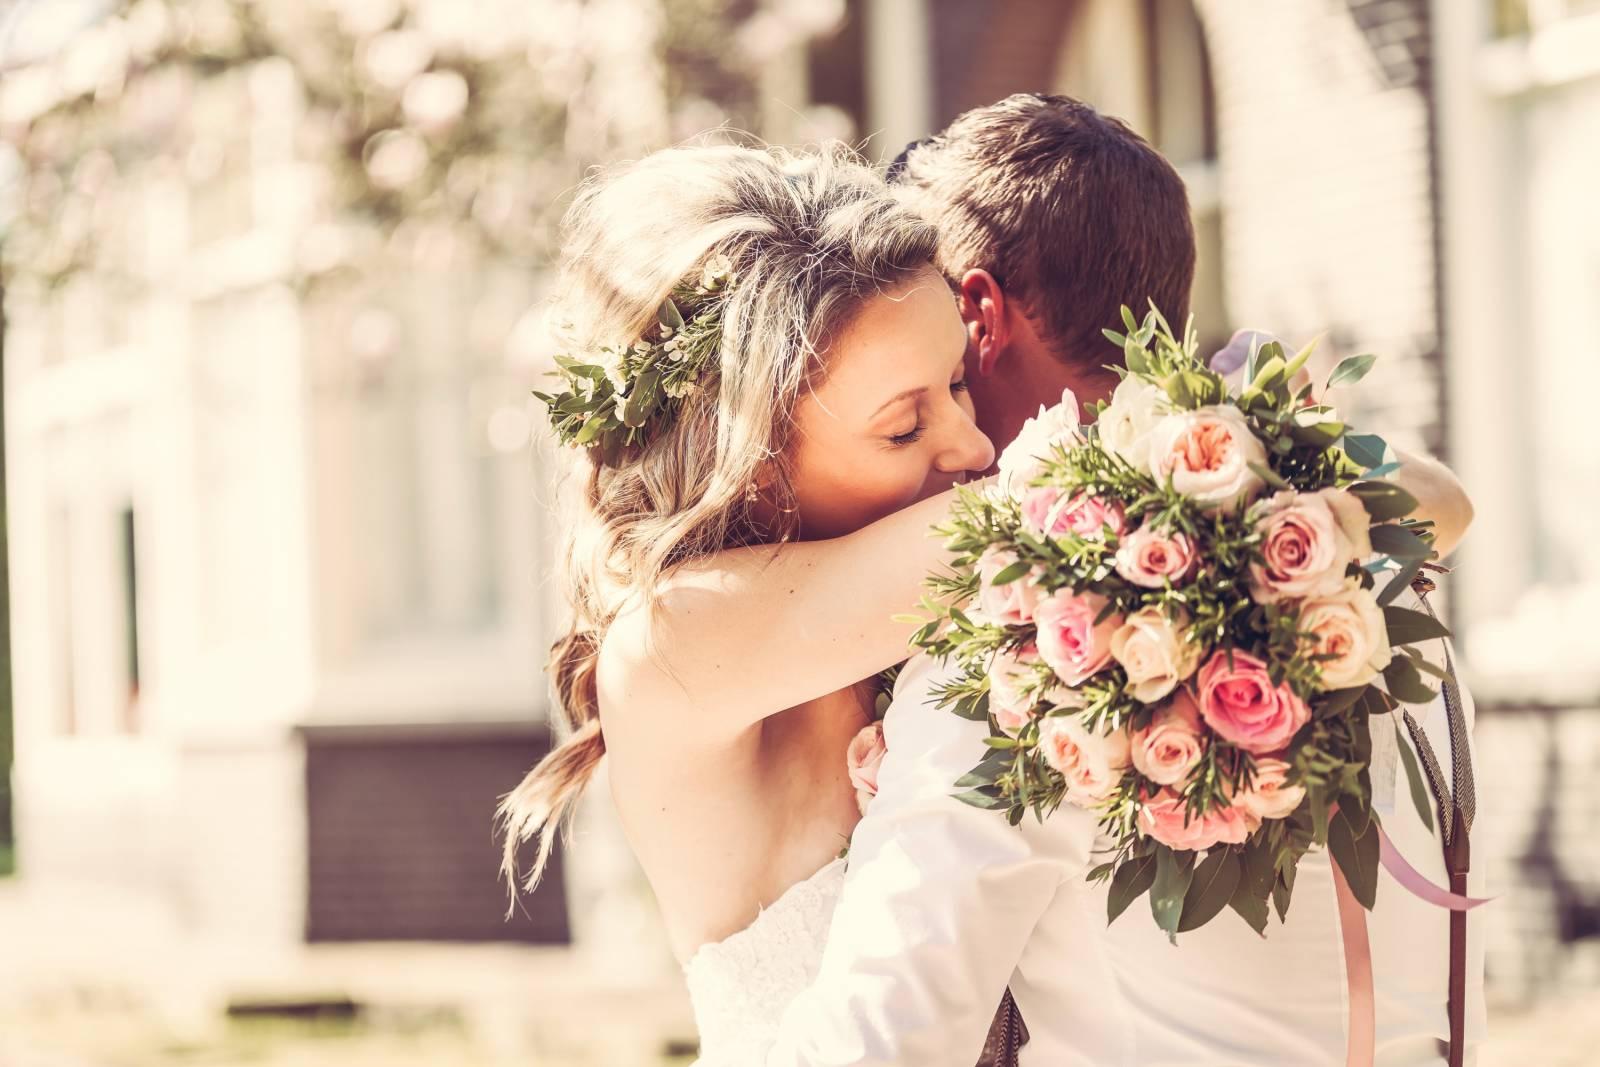 Florentius - Bloemen - House Of Weddings - 25